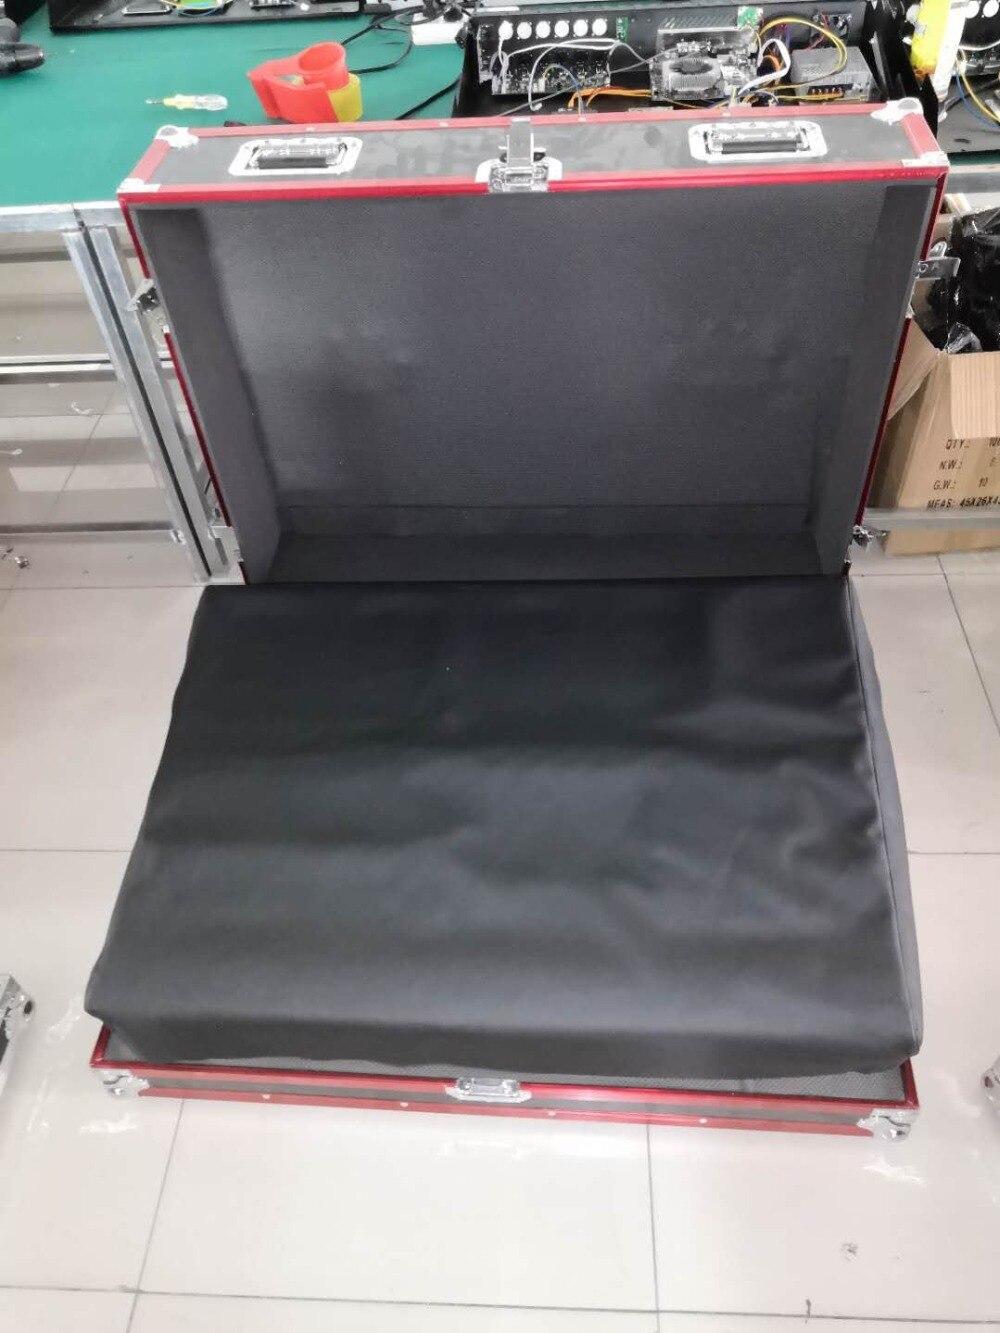 Controlador profesional de iluminación de escenario ma2 dmx de China con caja de vuelo 3 uds pantalla táctil de 15,4 pulgadas para equipos de dj